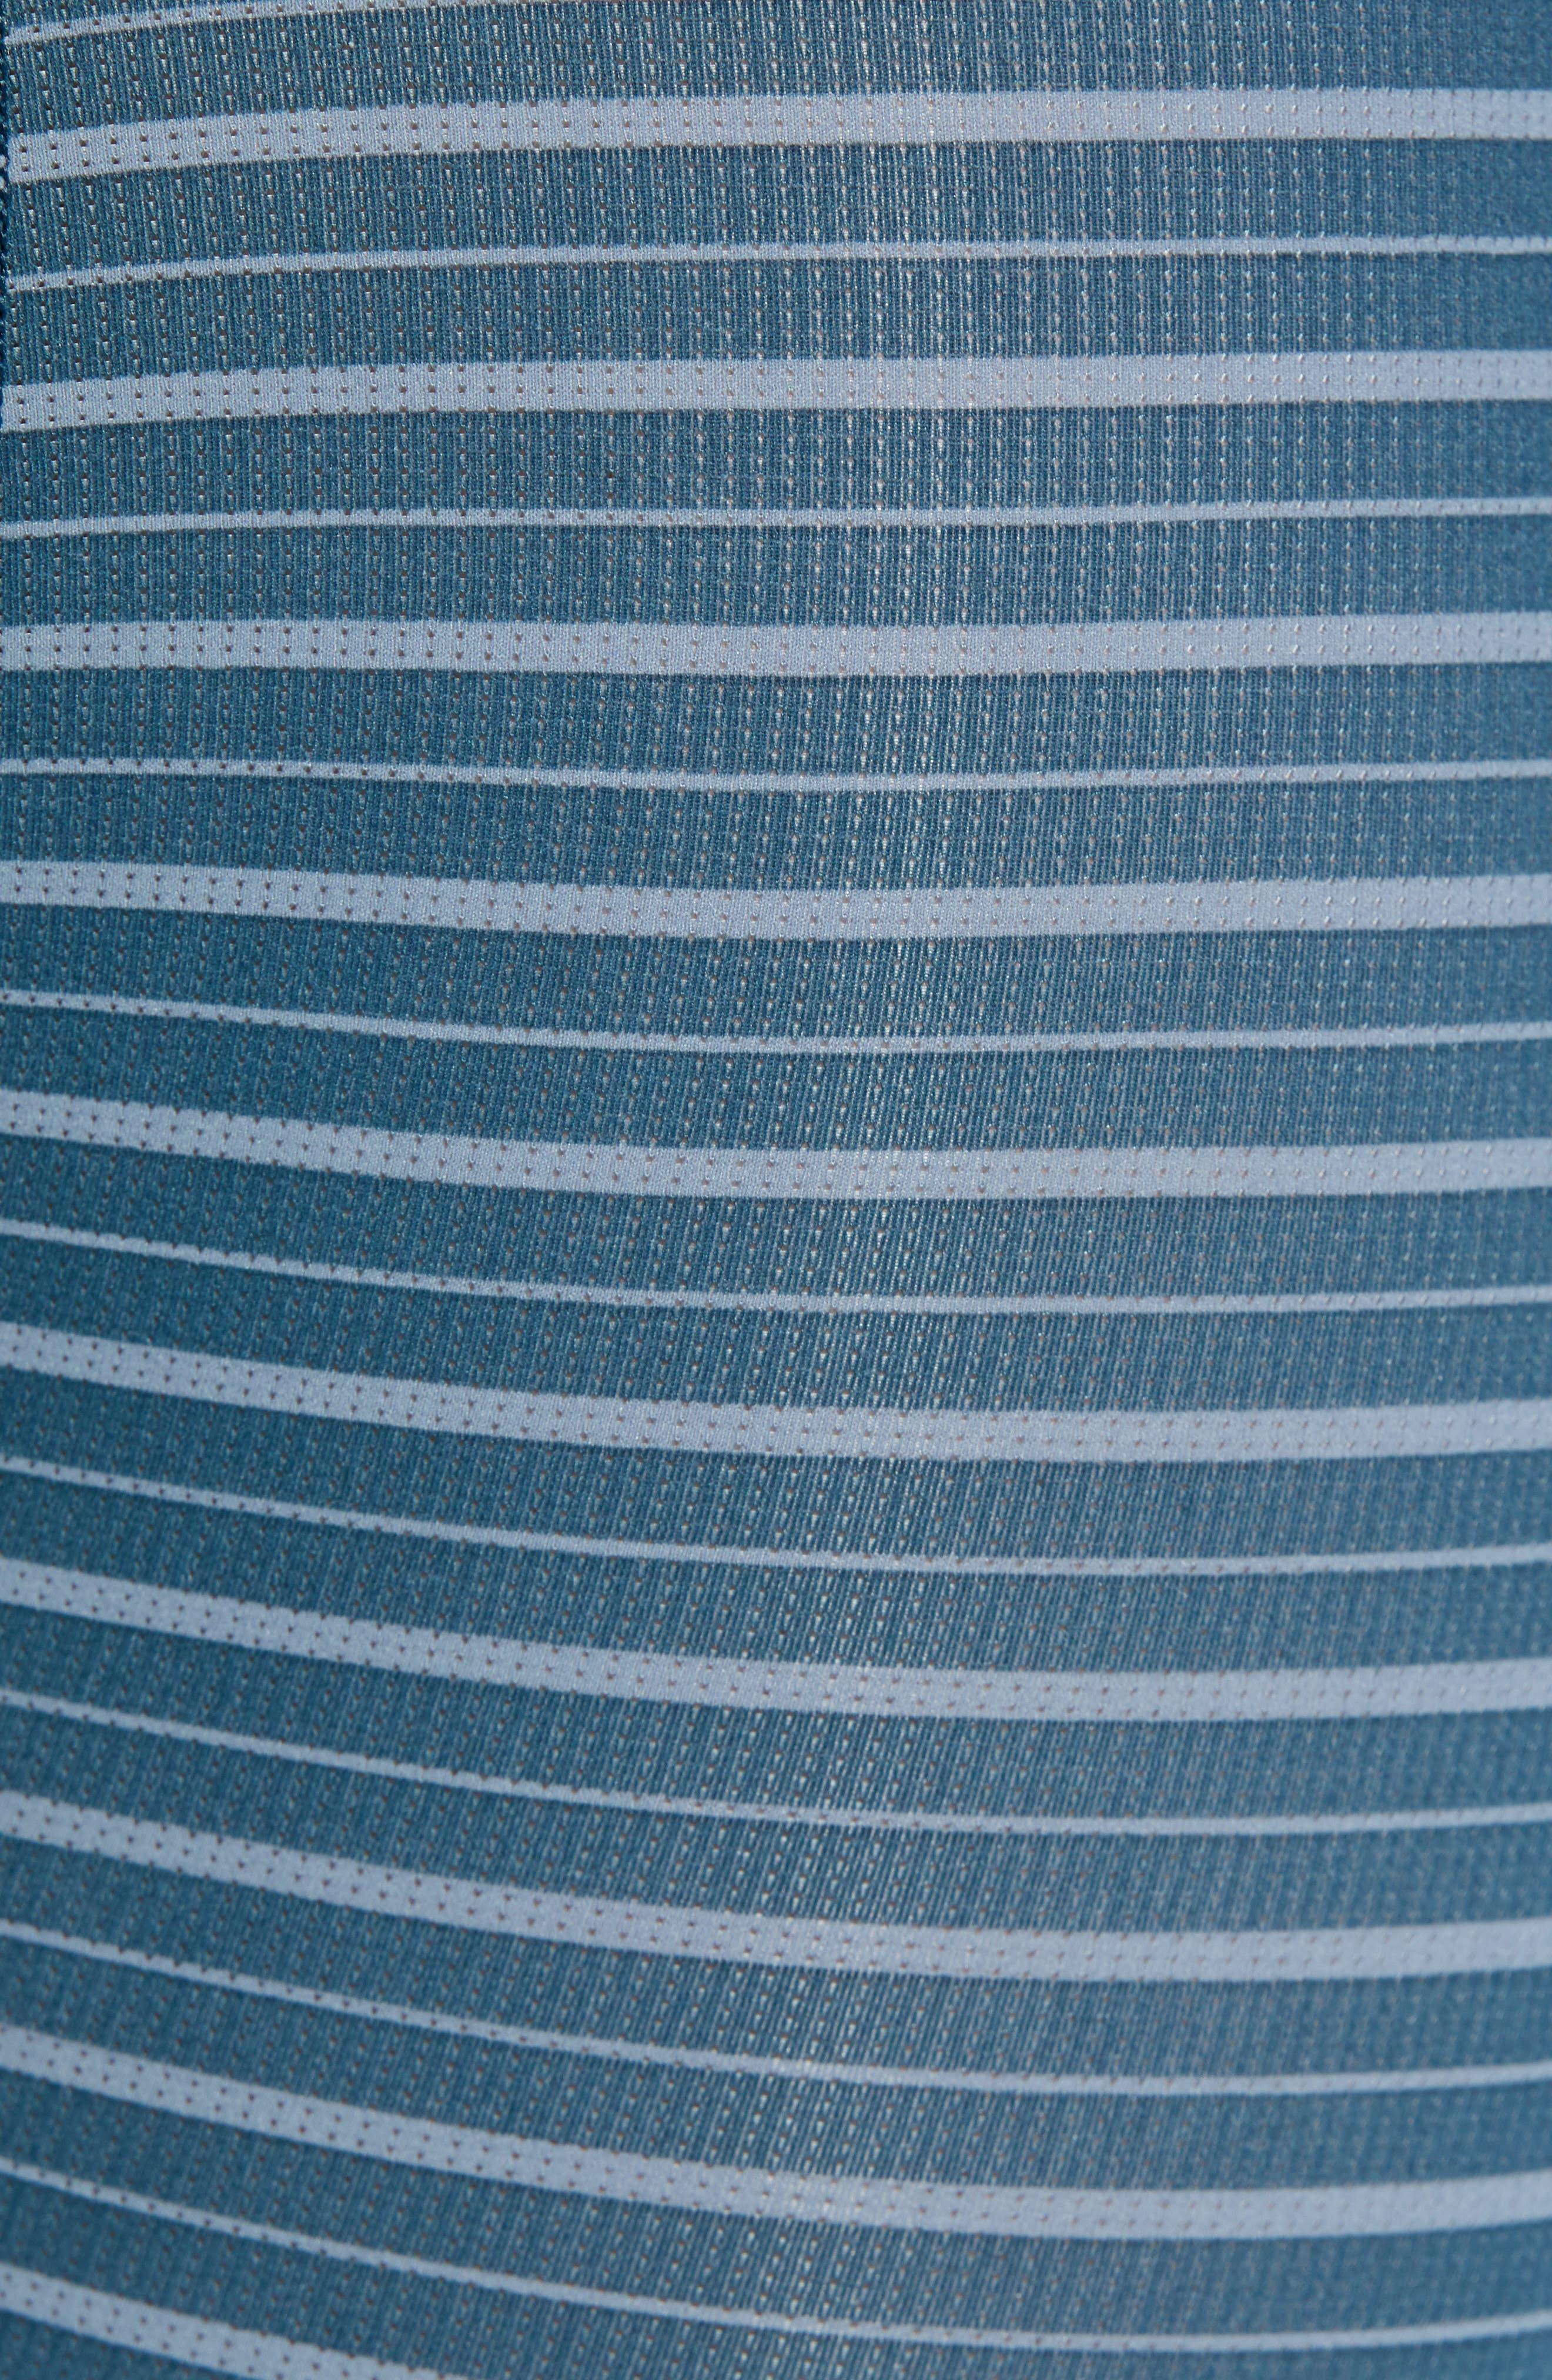 Air Boxer Briefs,                             Alternate thumbnail 5, color,                             REFLECTING POND/ BLUE MIRAGE